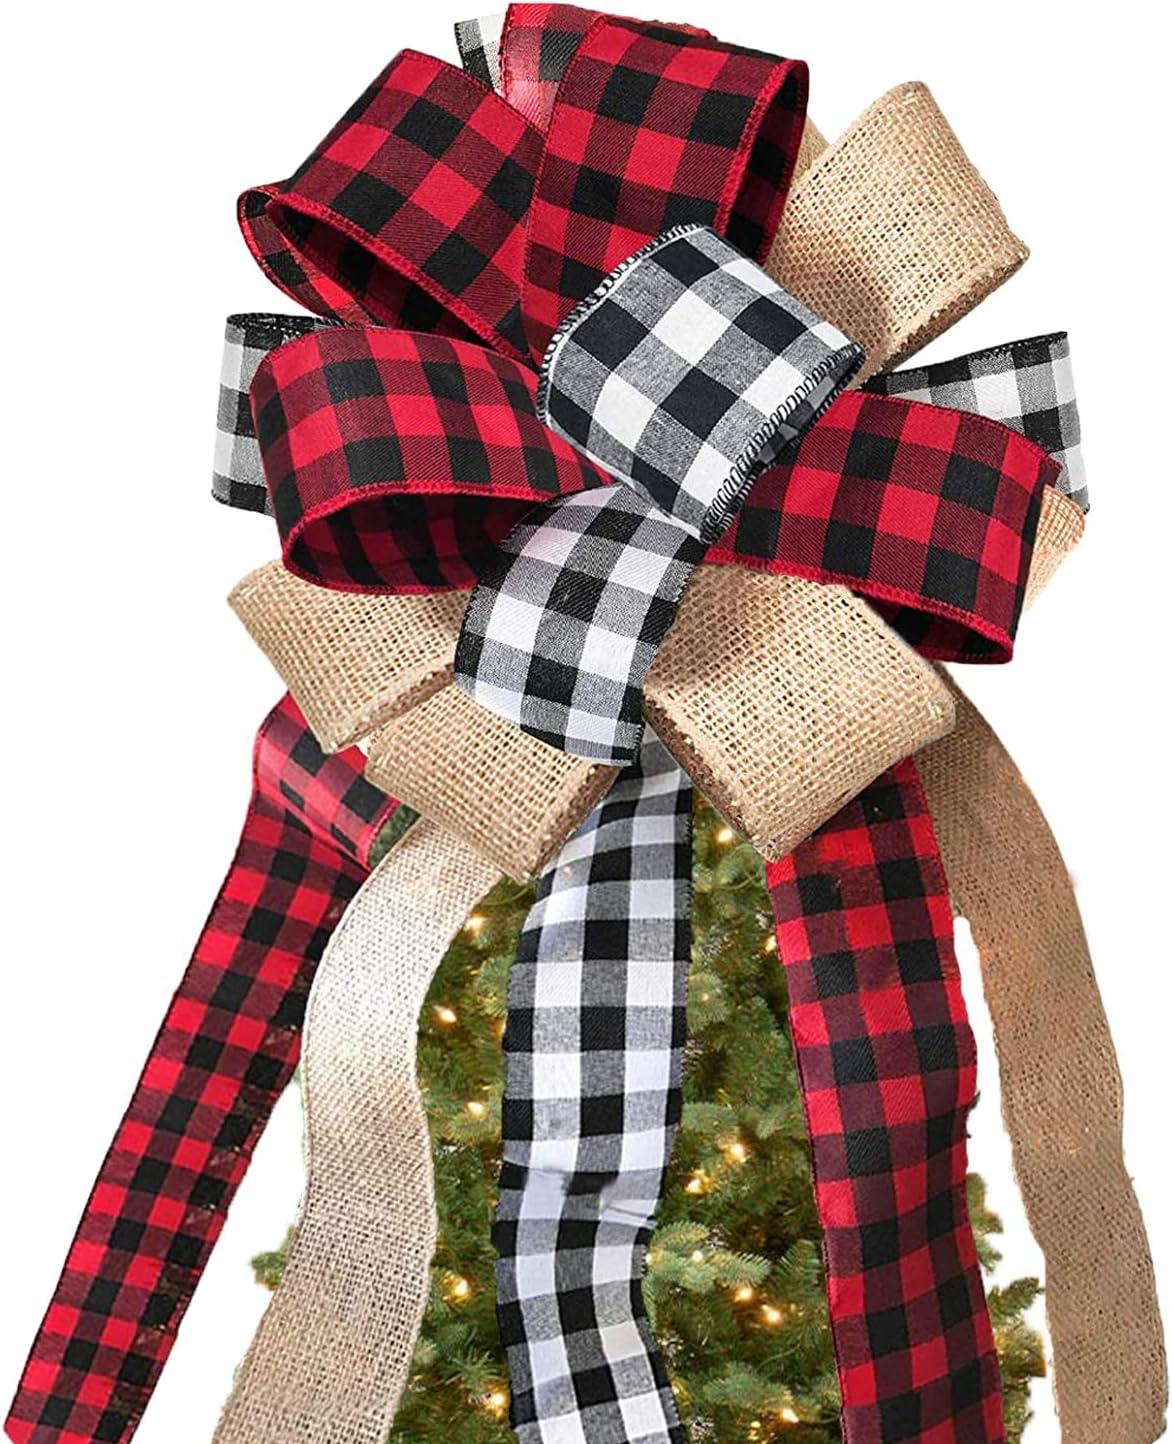 Svnntaa Christmas Tree Topper Buffalo Plaid Decorative Bow,Handmade Farmhouse Large Gift Bow Door Bows Banister Bow Christmas Bows for Holiday Home Decor